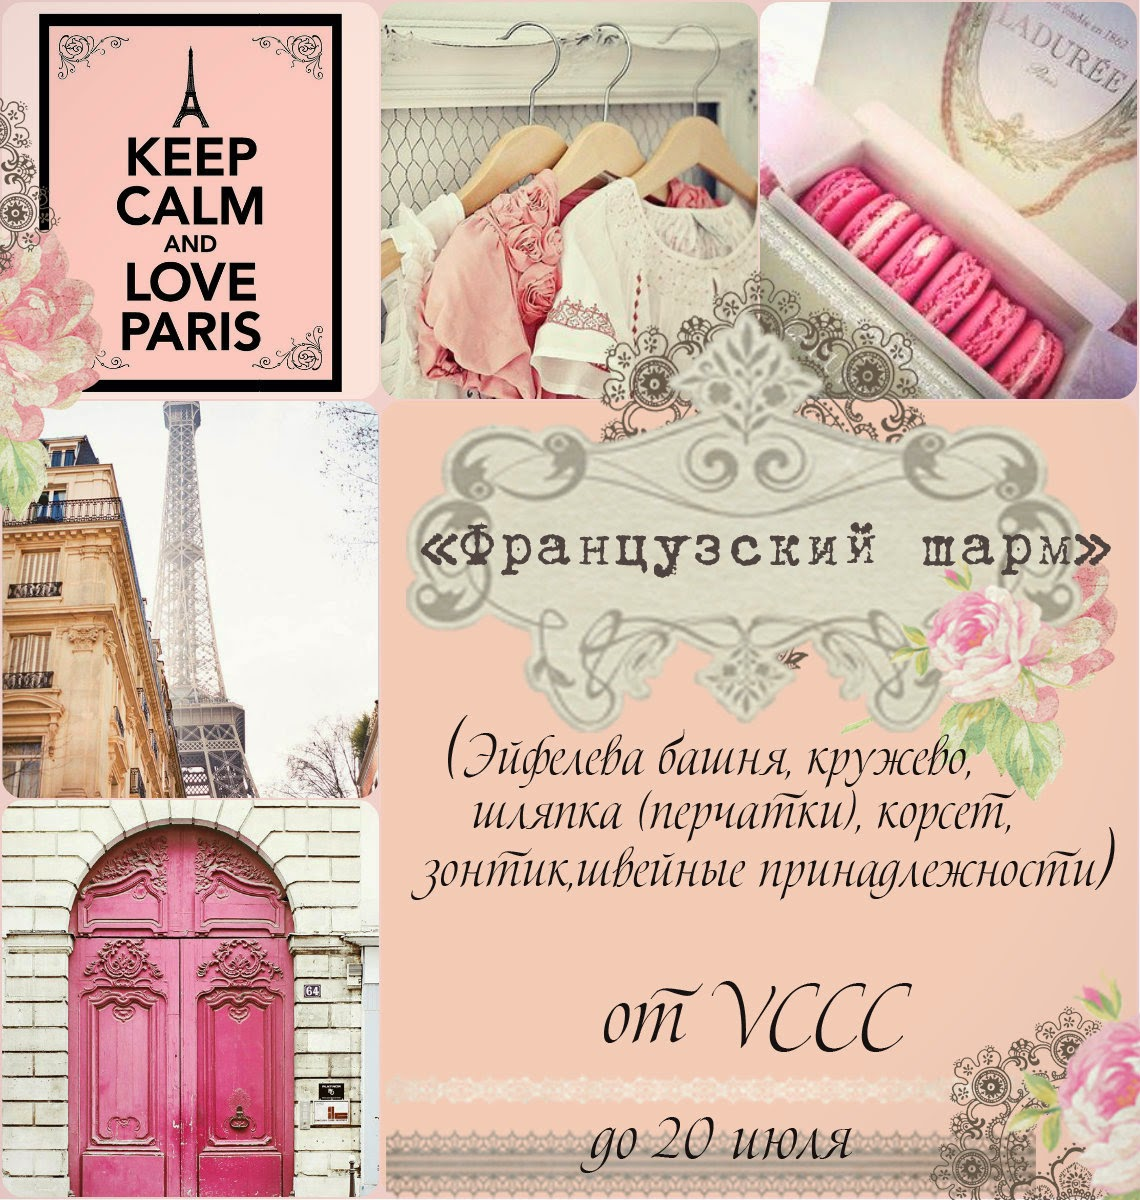 http://vintagecafecard.blogspot.com/2014/07/blog-post.html